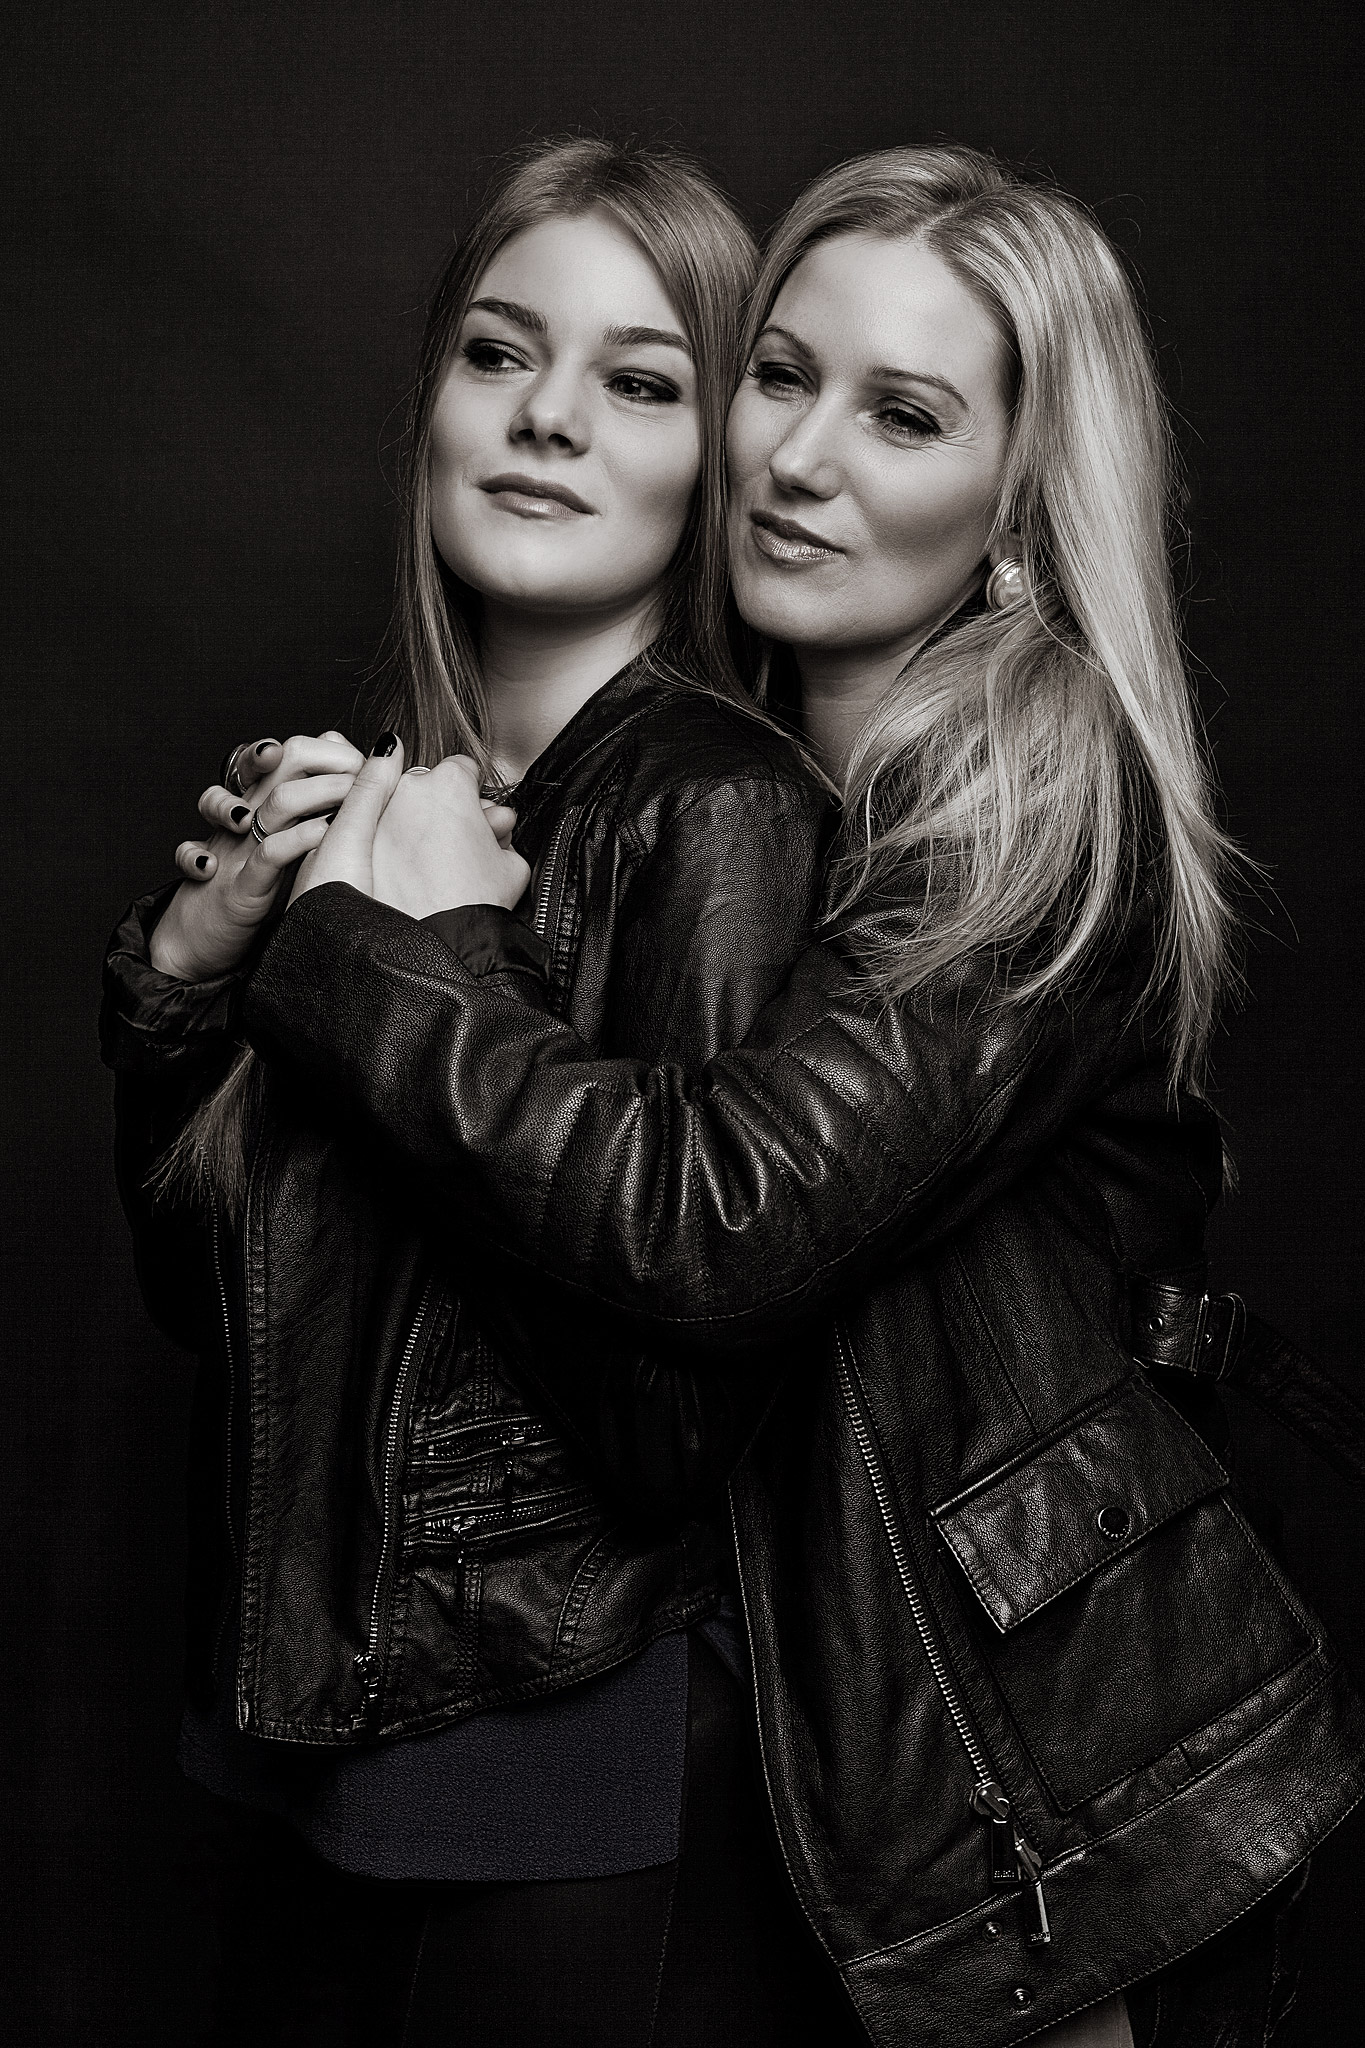 Jana und Claudia_3